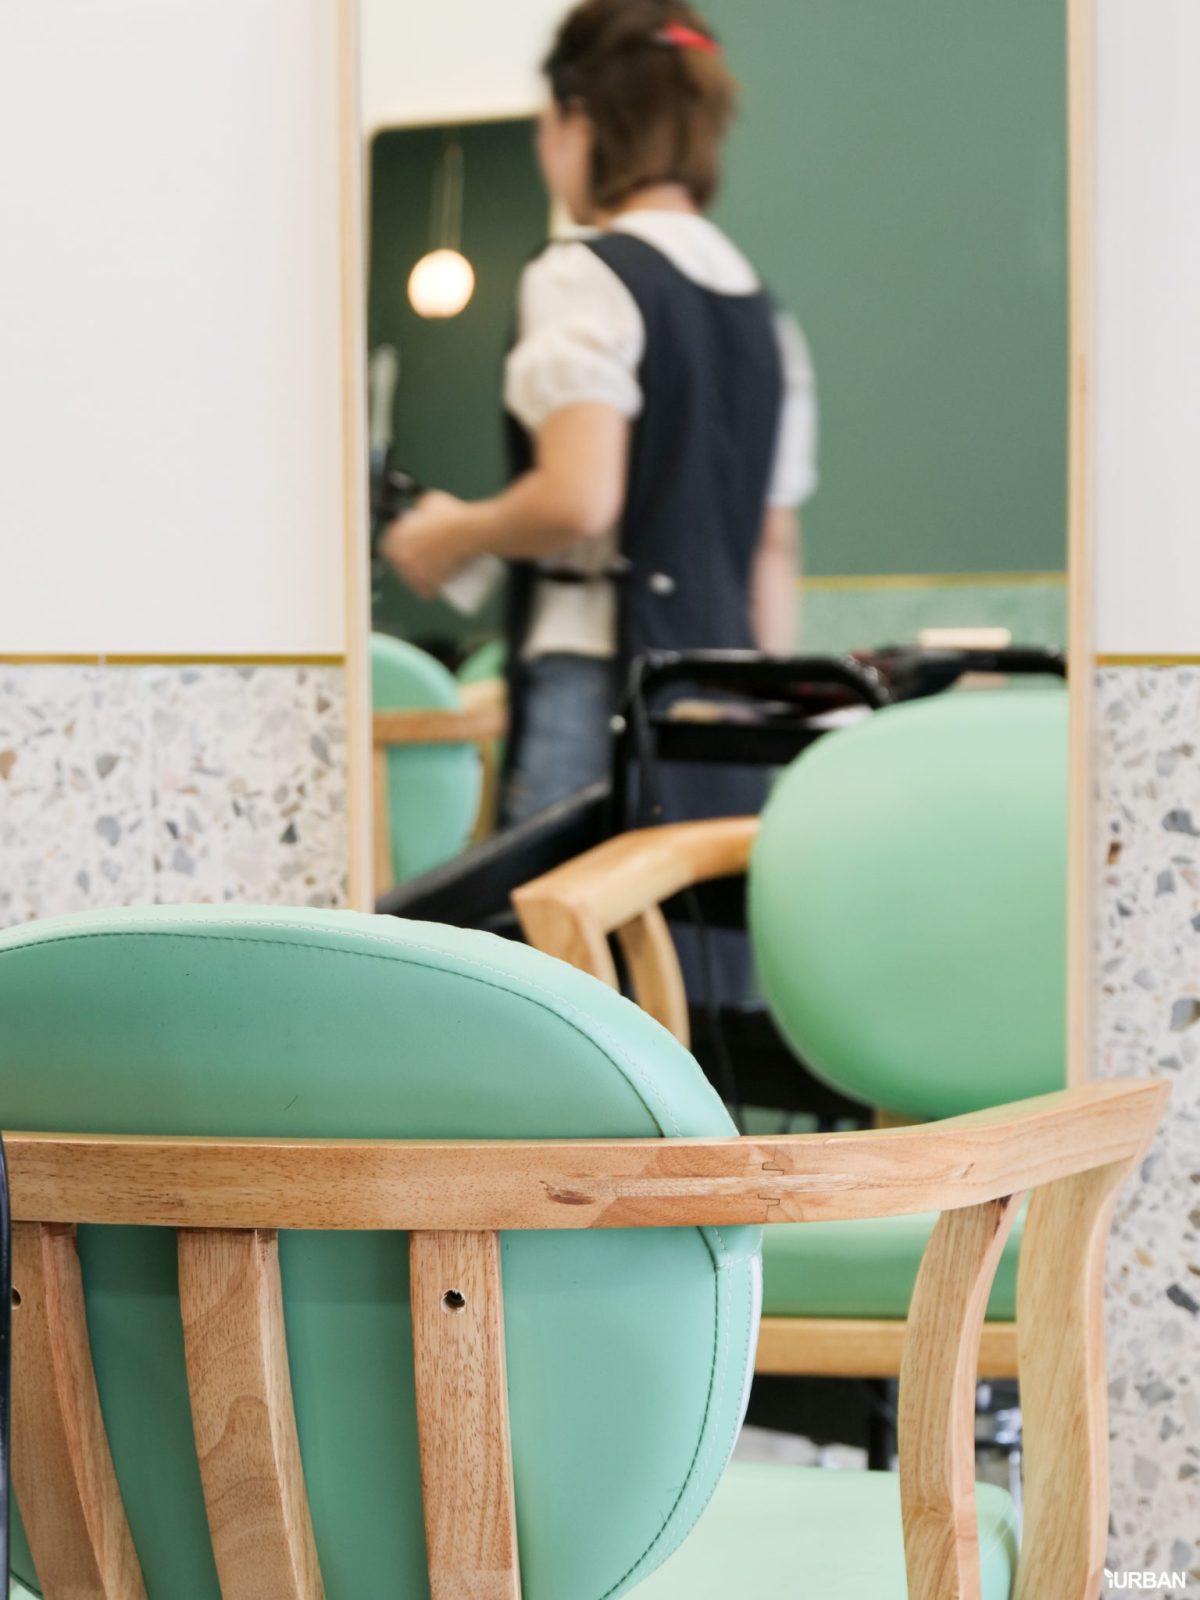 "7 Simply Creative Cafe & Bar ในย่านไลฟ์สไลต์สุดฮิป กับ 24 Hr. Co-Working Space กลาง New Interchange ""รัชดา - ลาดพร้าว"" 82 - cafe"